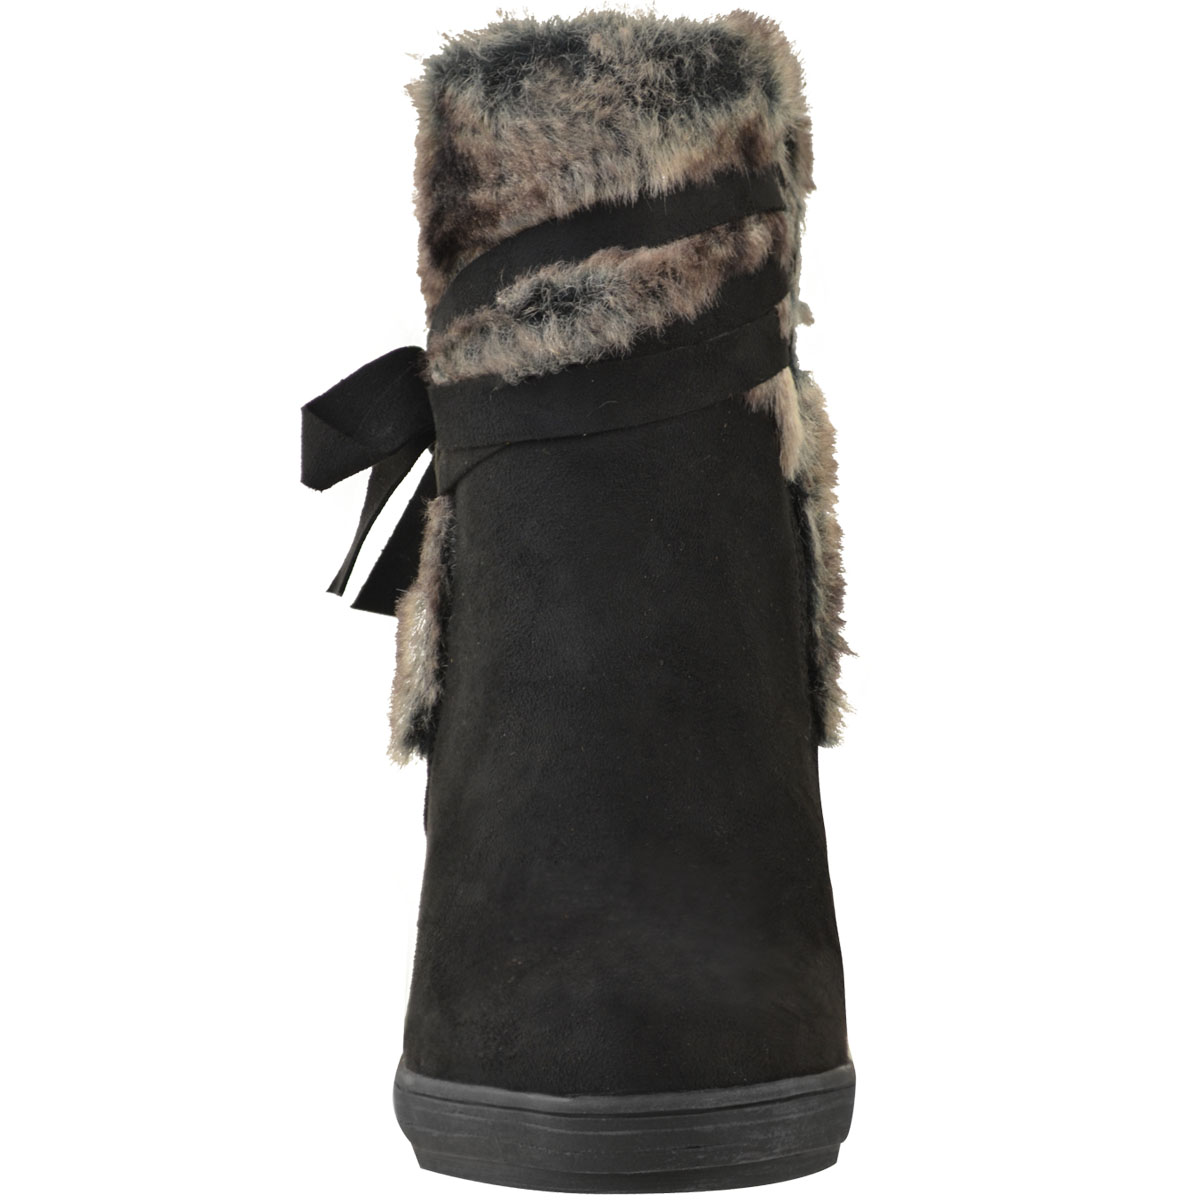 Womens-Ladies-Wedge-Low-Heel-Winter-Knee-Boots-Warm-Faux-Fur-Fleece-Size-UK thumbnail 23